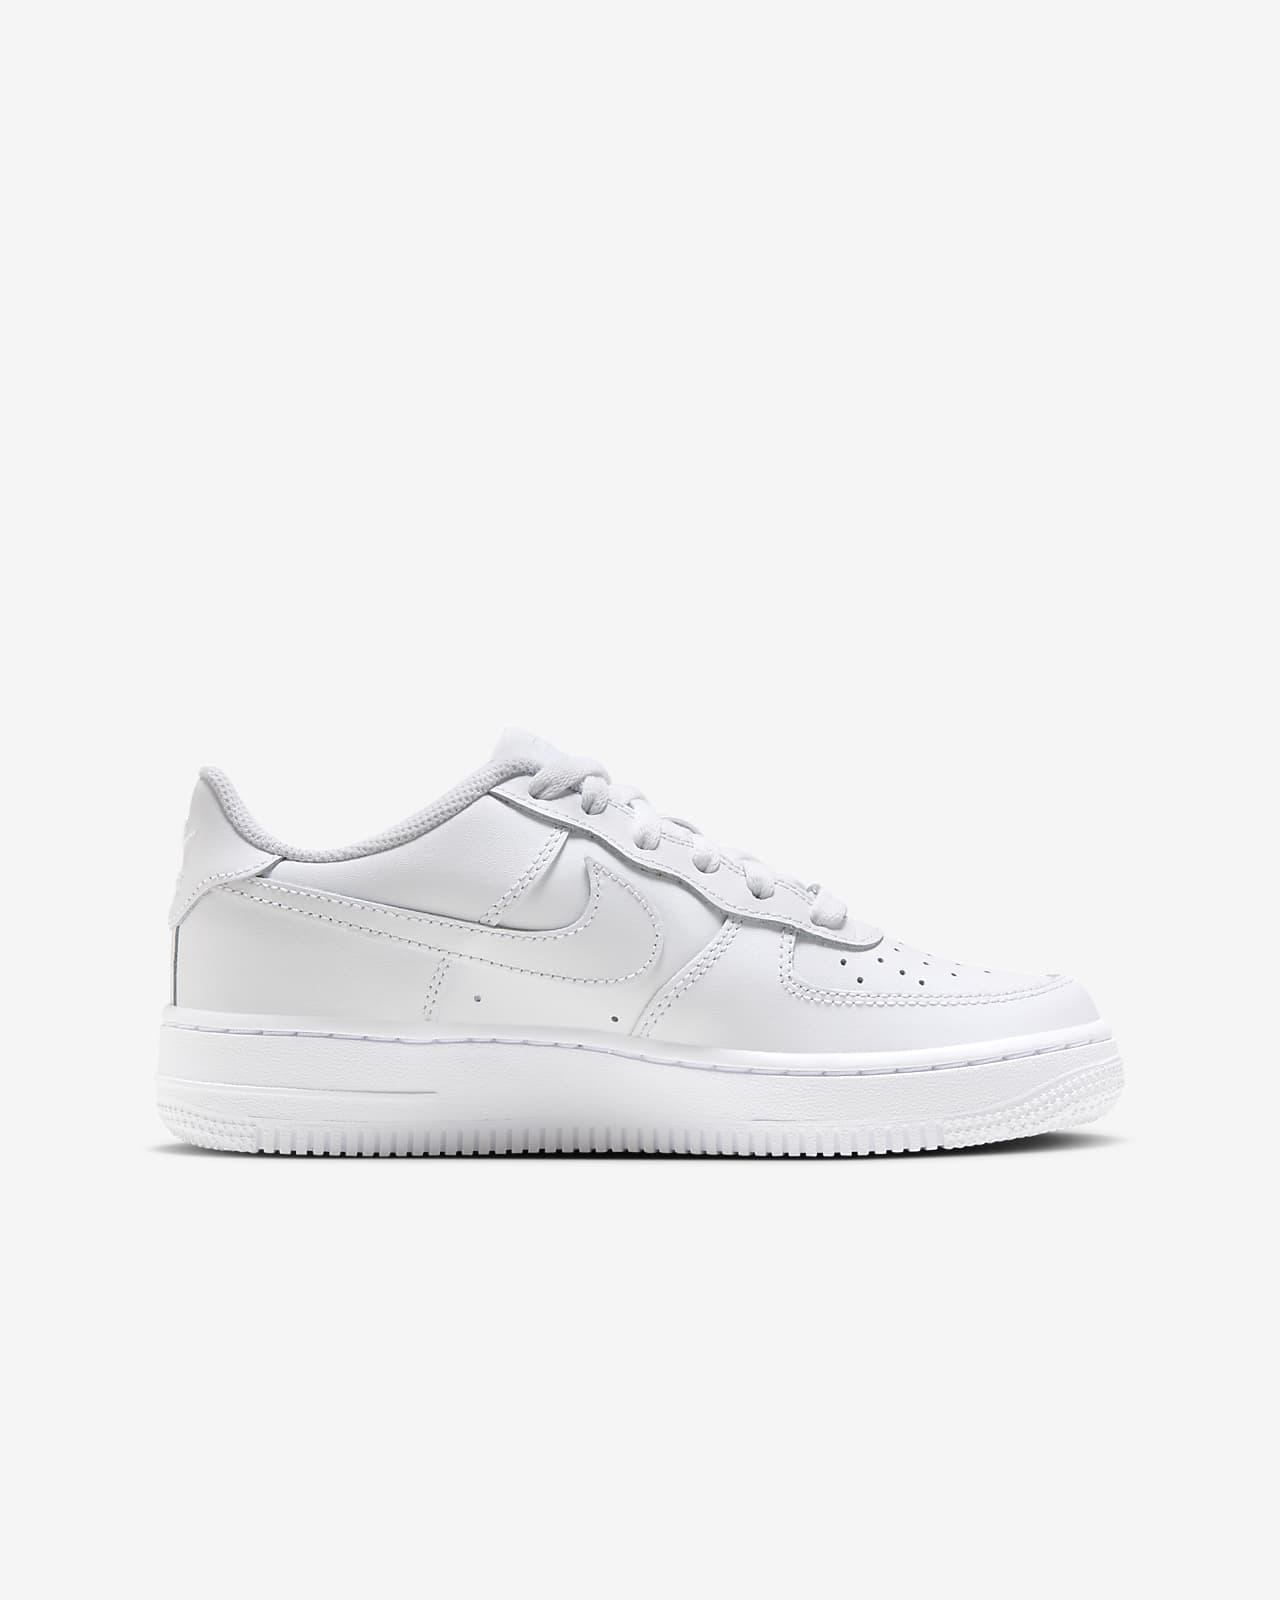 Nike Air Force 1 LE Older Kids' Shoe. Nike LU